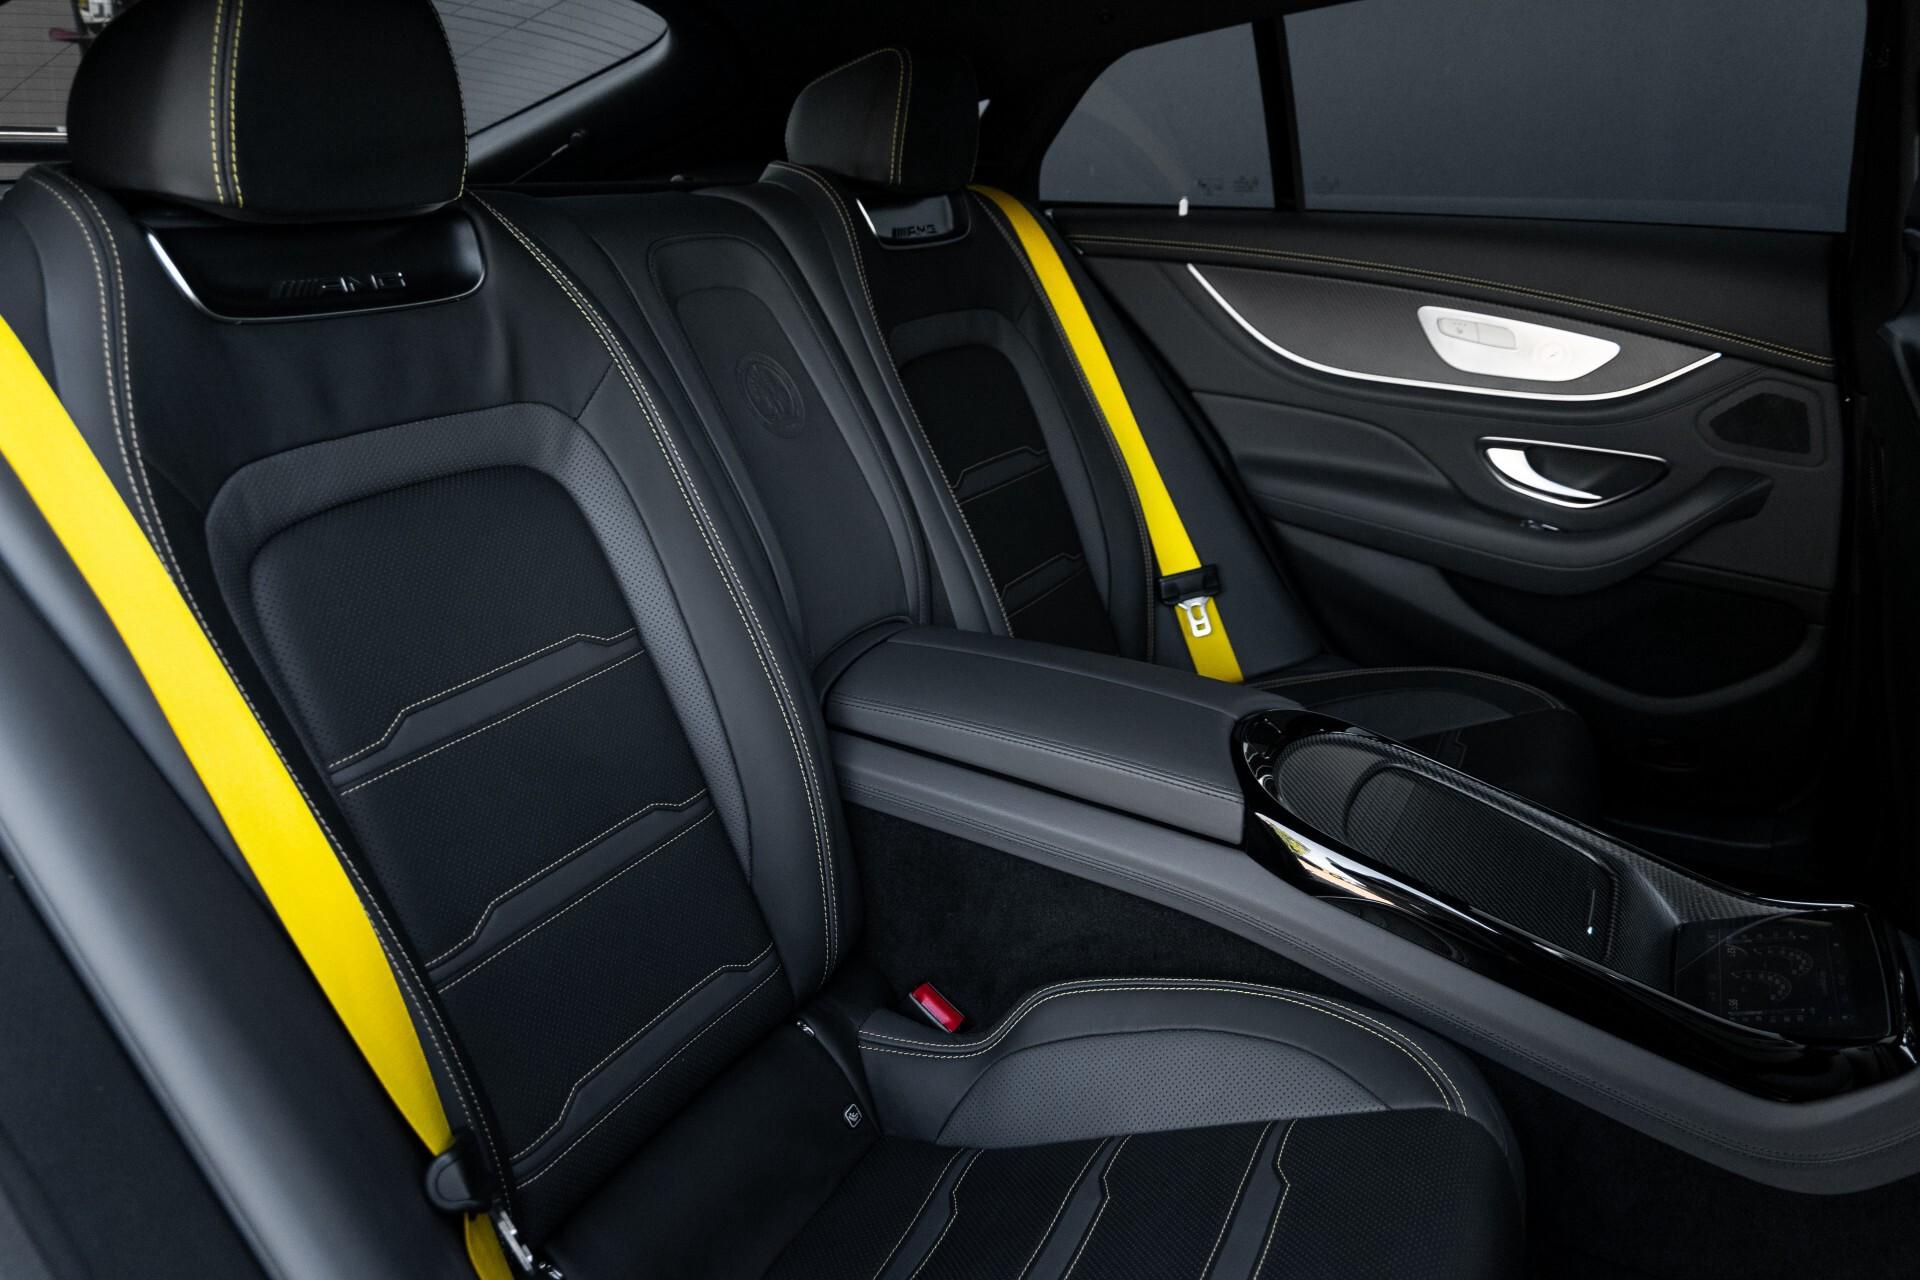 Mercedes-Benz AMG GT 4-Door Coupe 63 S 4MATIC+ Edition 1 Keramisch/Carbon/First Class/Dynamic Plus/Burmester High End 3D Aut9 Foto 5